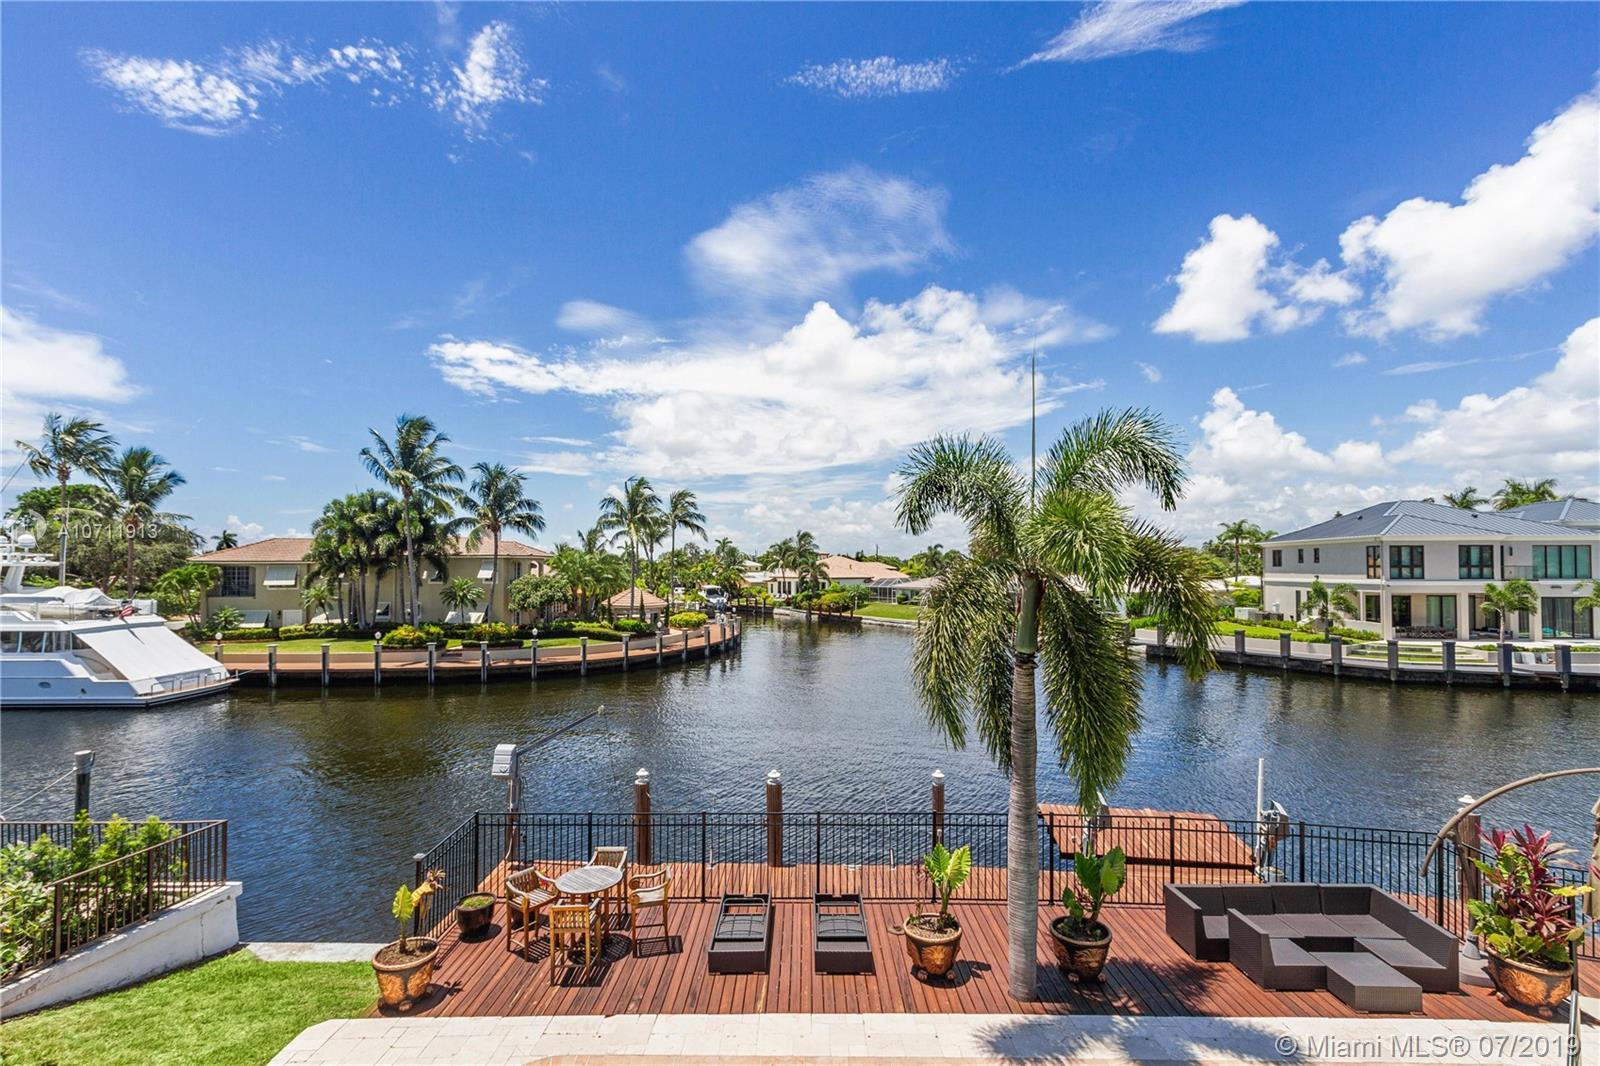 1121 SE 13th Ave - Deerfield Beach, Florida